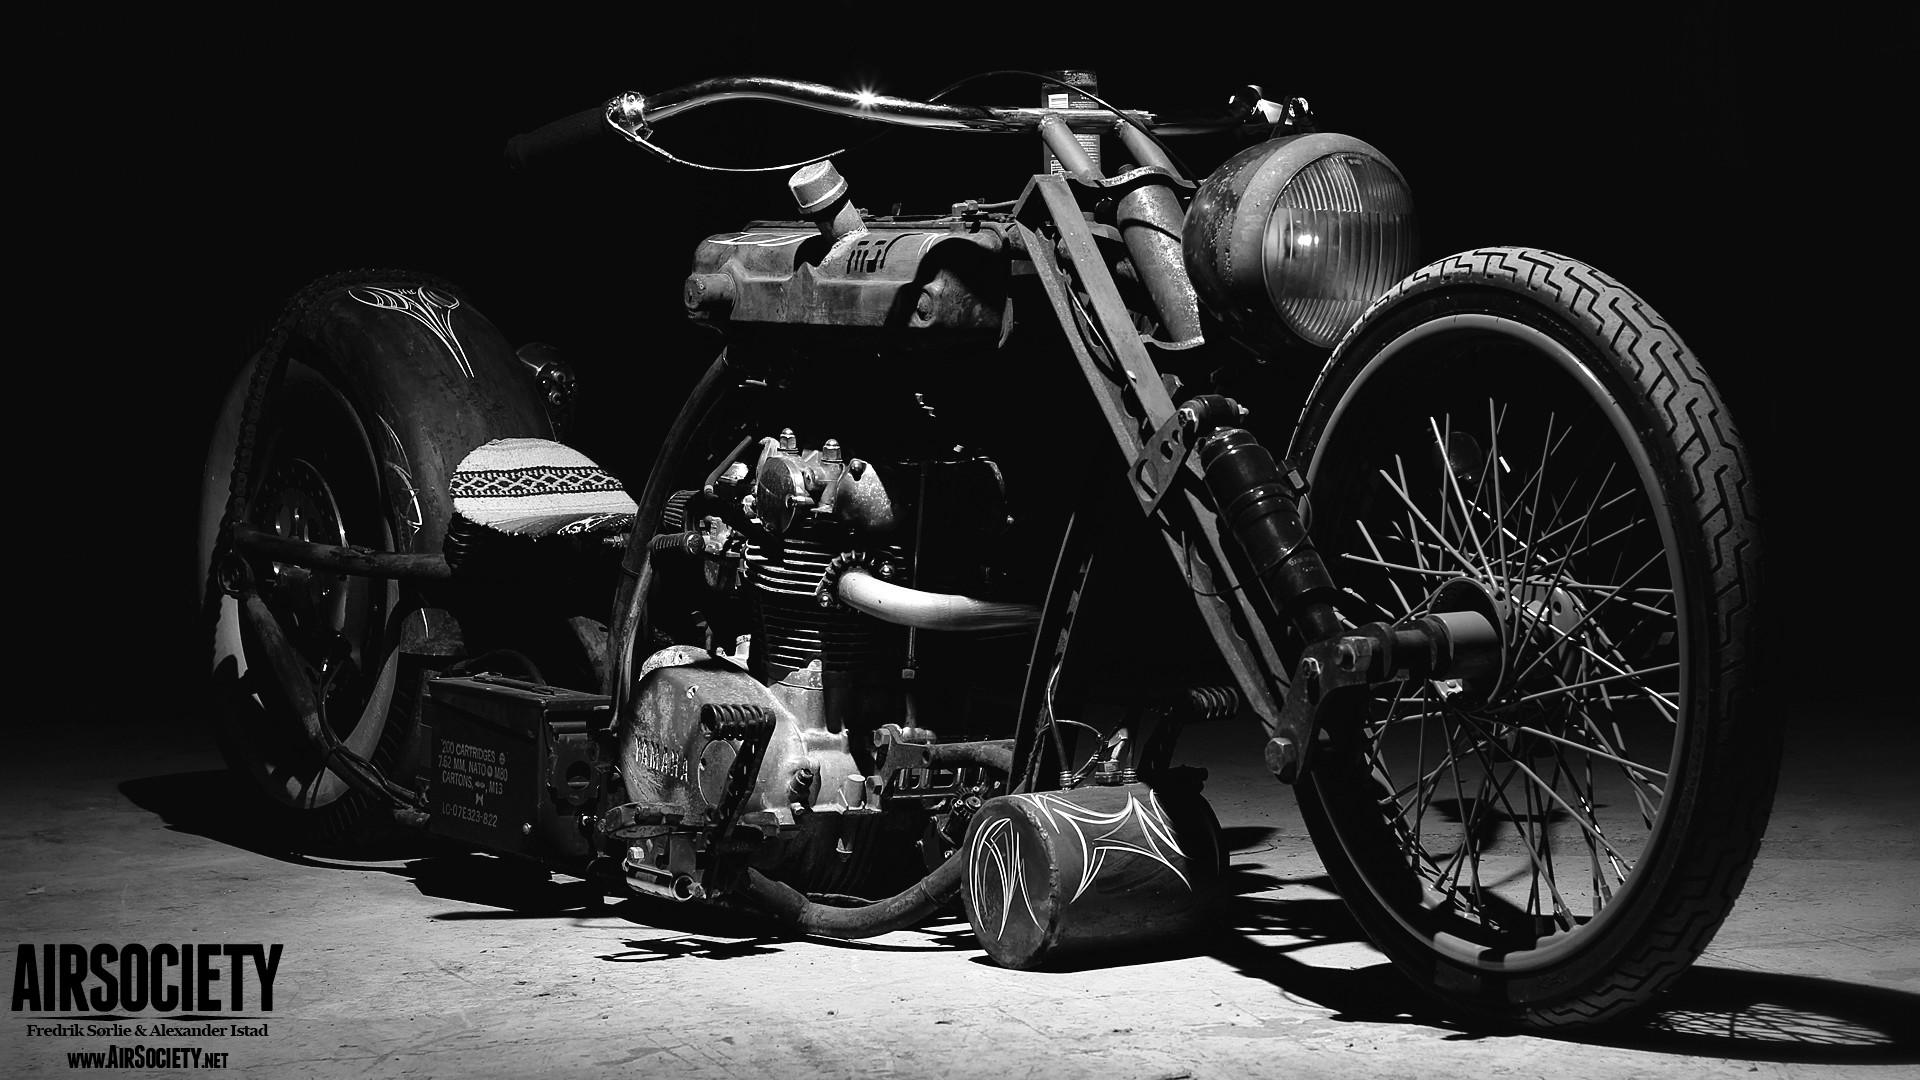 … rat-bike-air-ride-suspension-bagged-rust-motorcycle- …